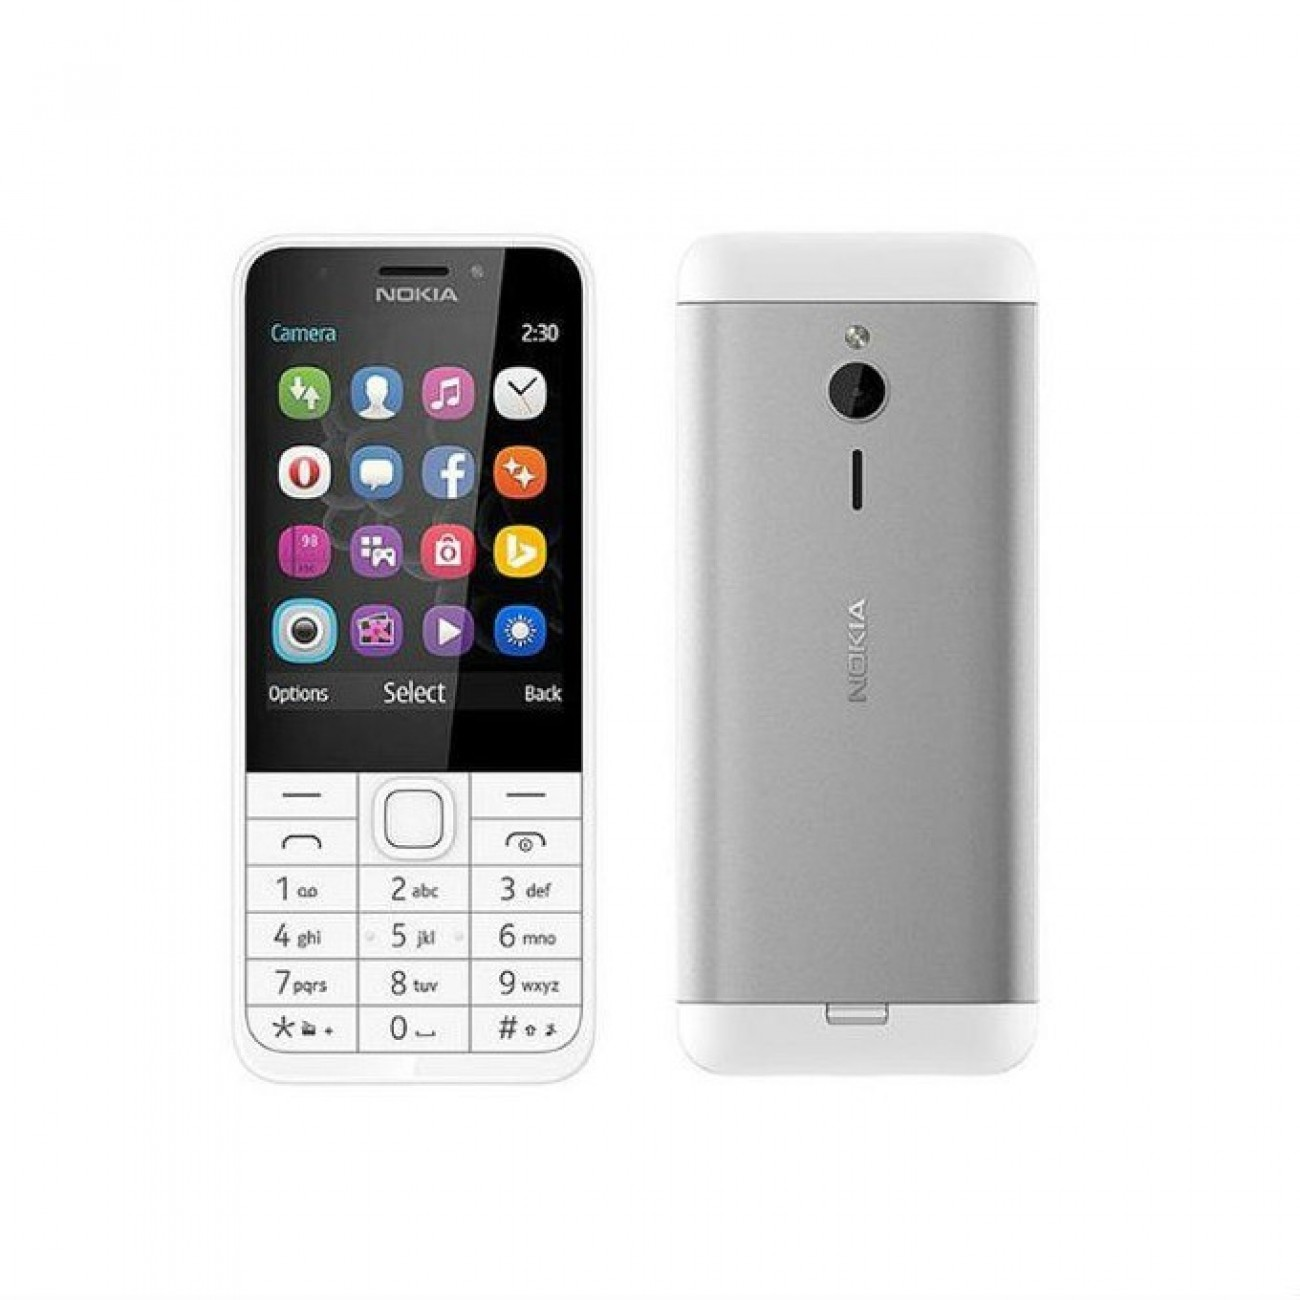 GSM NOKIA 230 (сребрист), 2.8 (7.11 cm), 16MB RAM, (+microSD слот), 2.0 Mpix camera, Software release: Series 30+, 91.8g. в Мобилни телефони - Nokia | Alleop